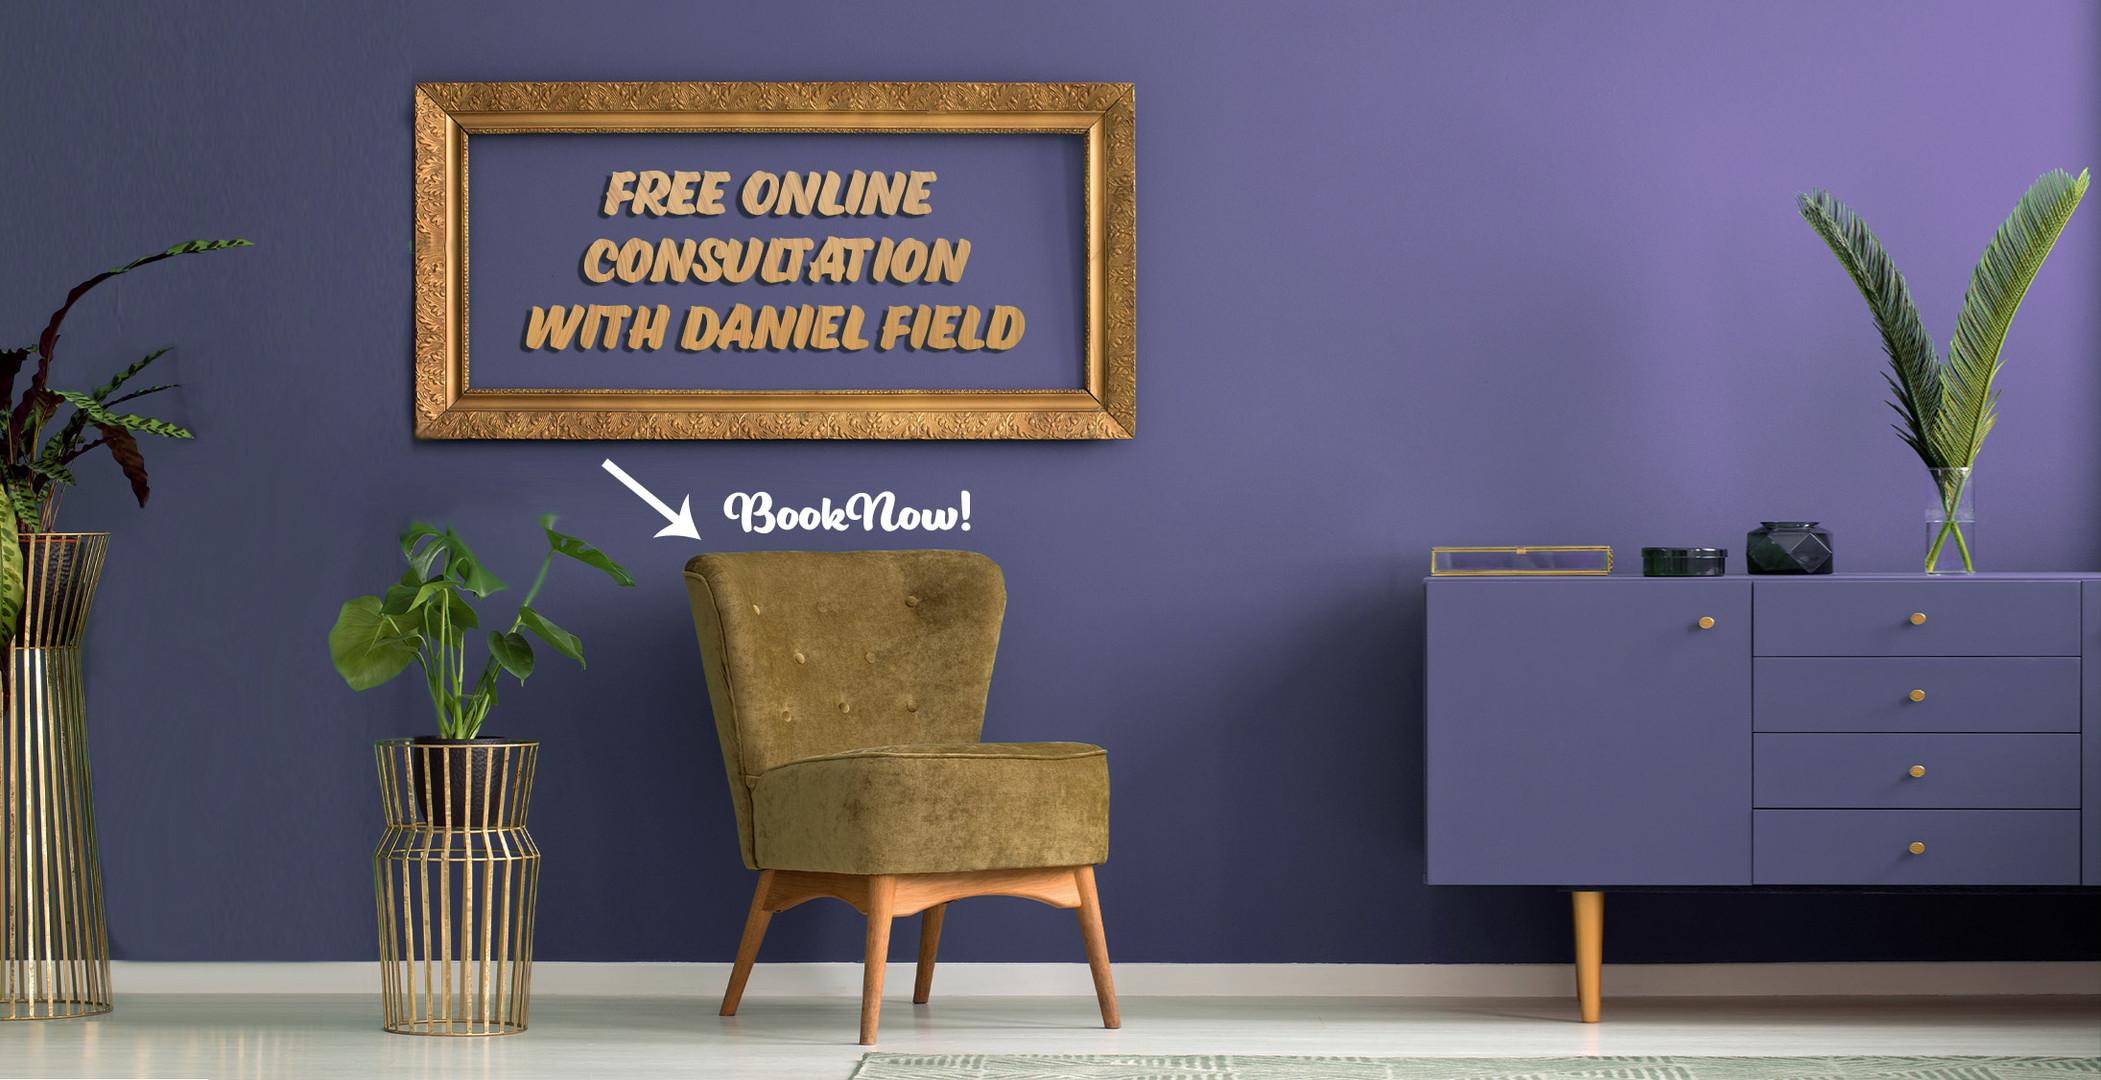 Consultations with daniel field v3.jpg